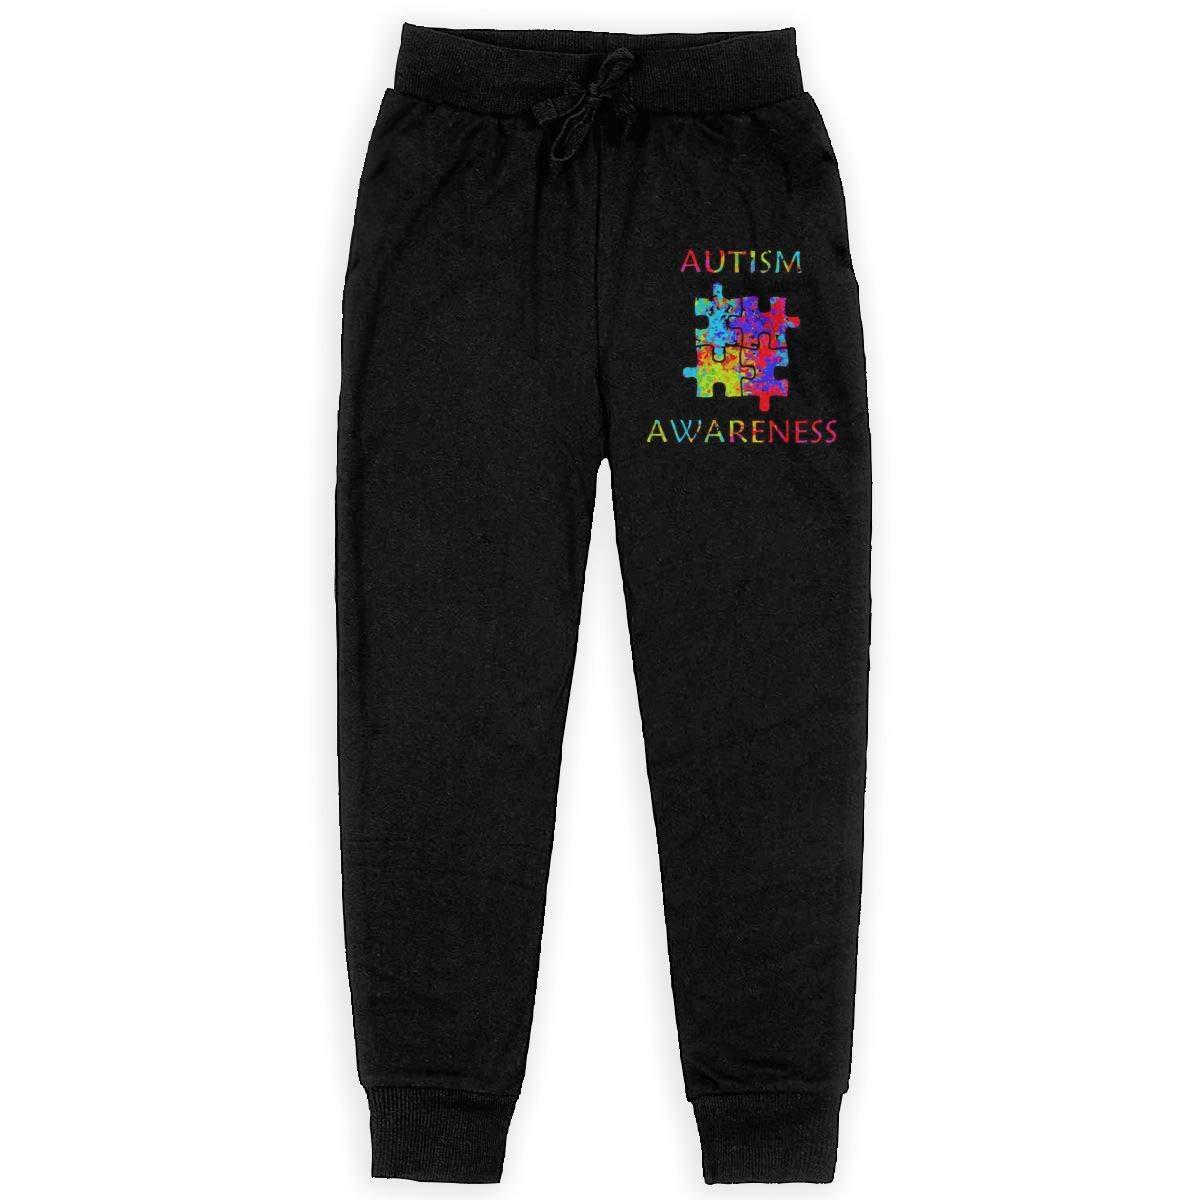 Girls Active Basic Jogger Fleece Pants for Teenager Boys WYZVK22 Autism Awareness Soft//Cozy Sweatpants